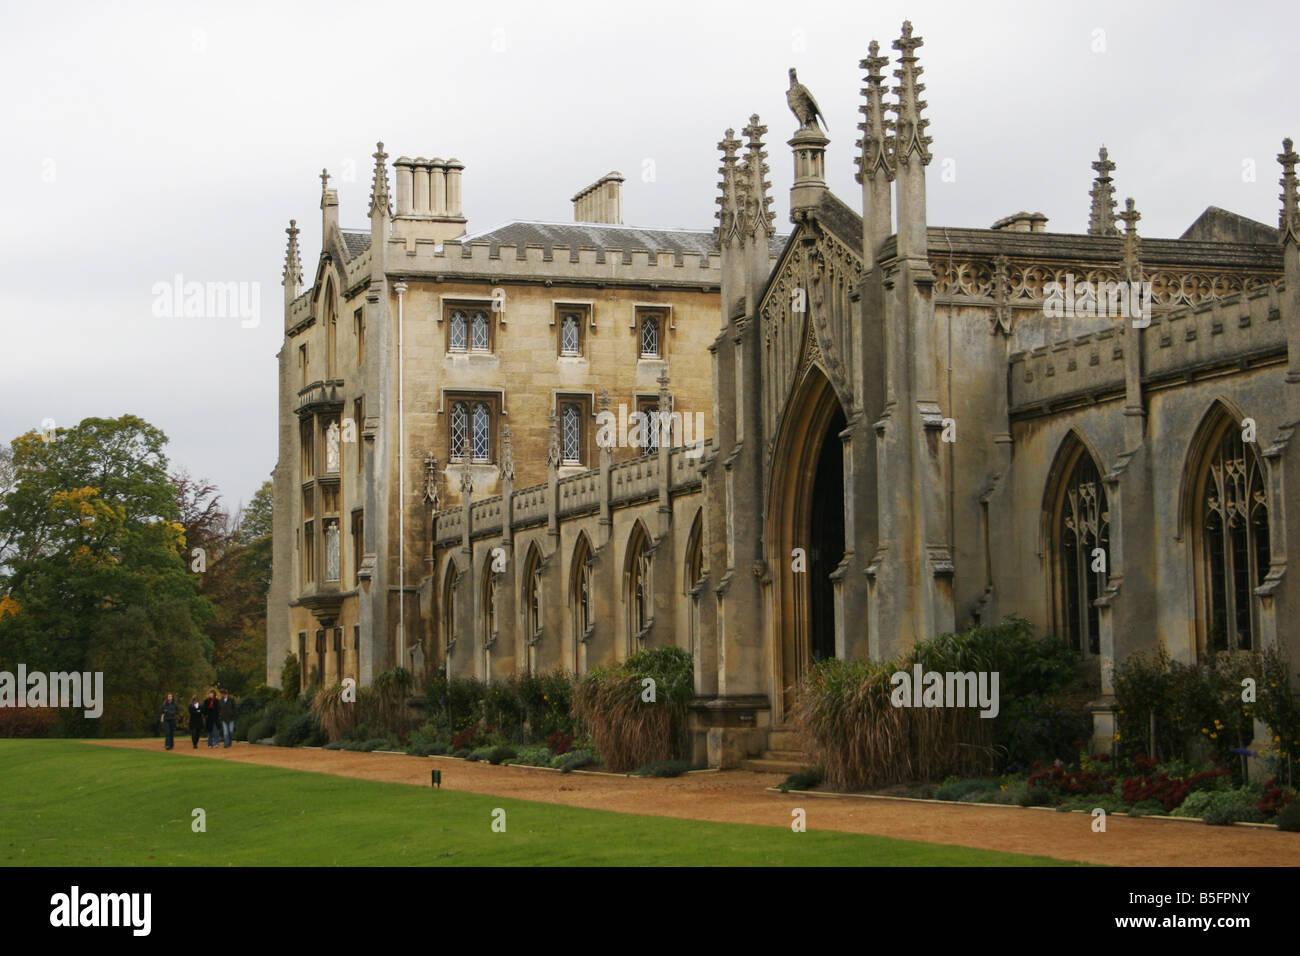 New Court at St. John's College Cambridge - Stock Image